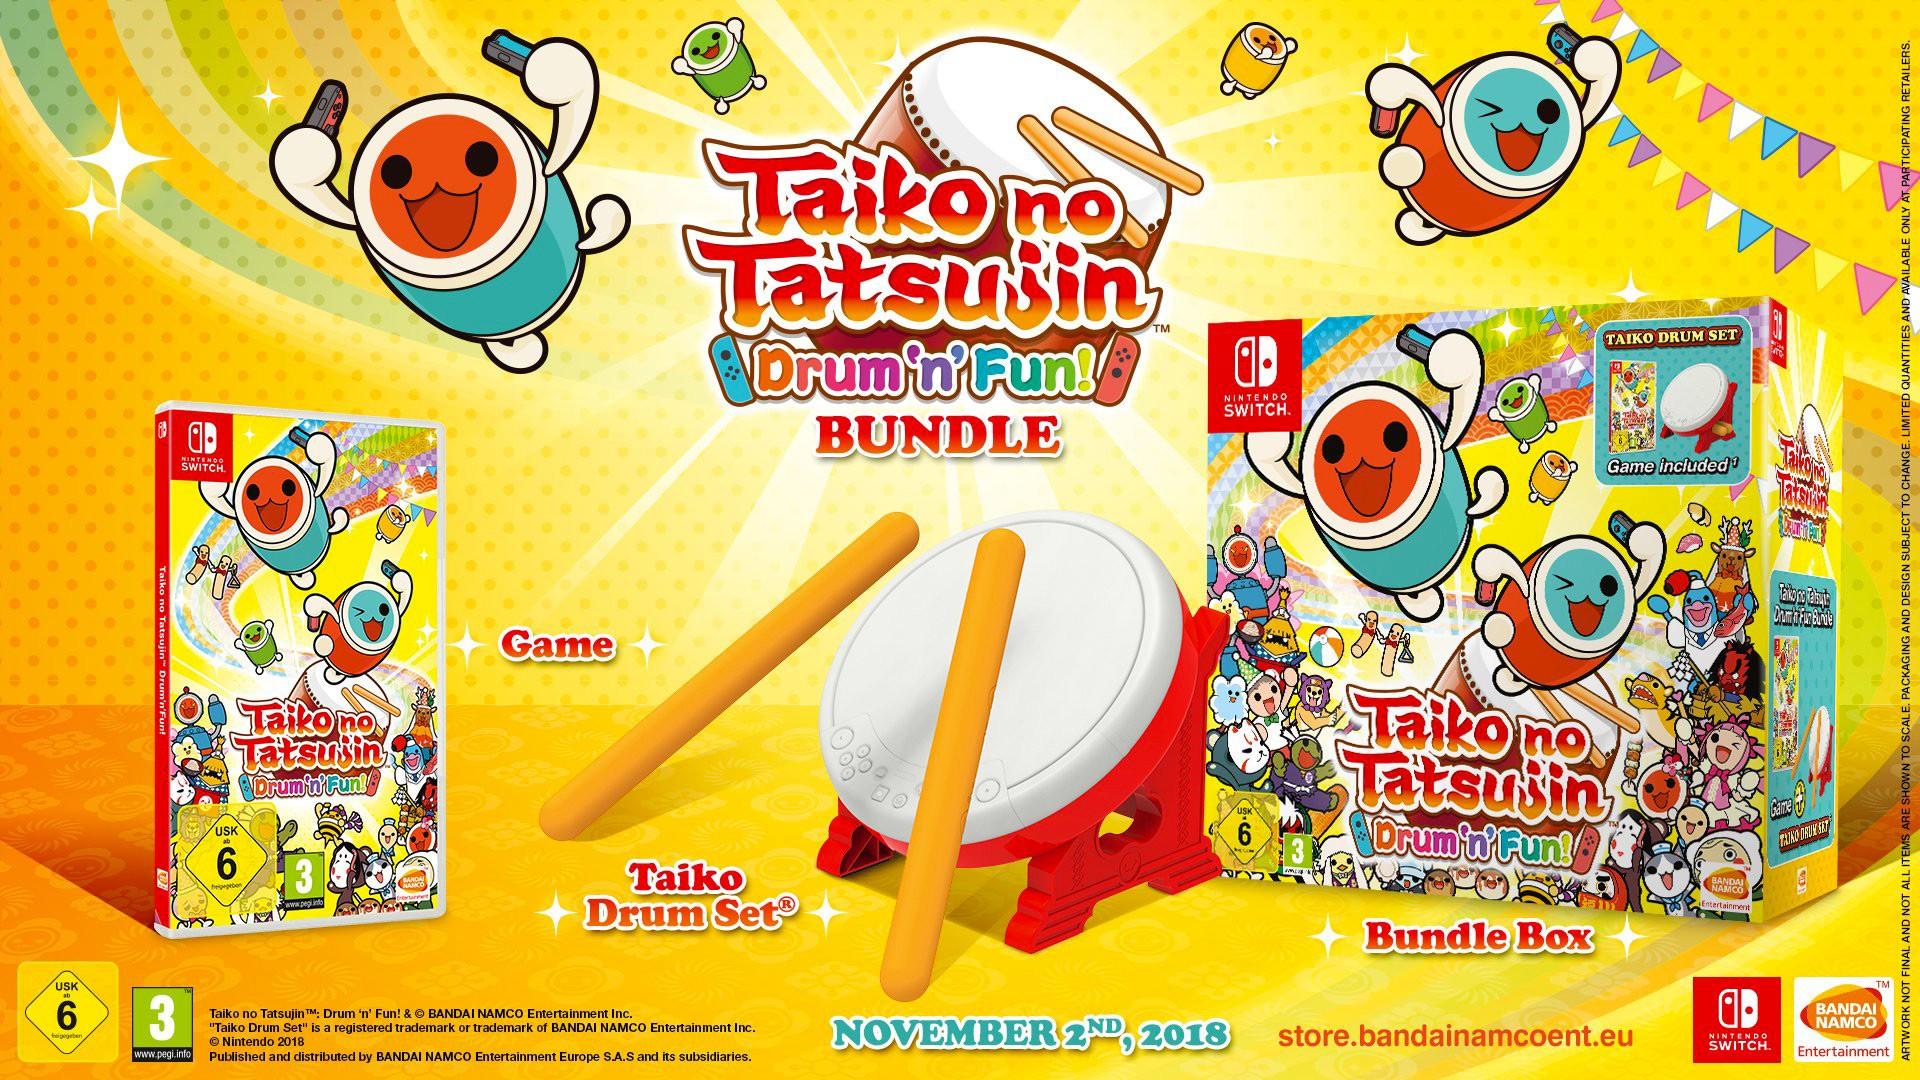 Taiko no Tatsujin: Drum 'n' Fun